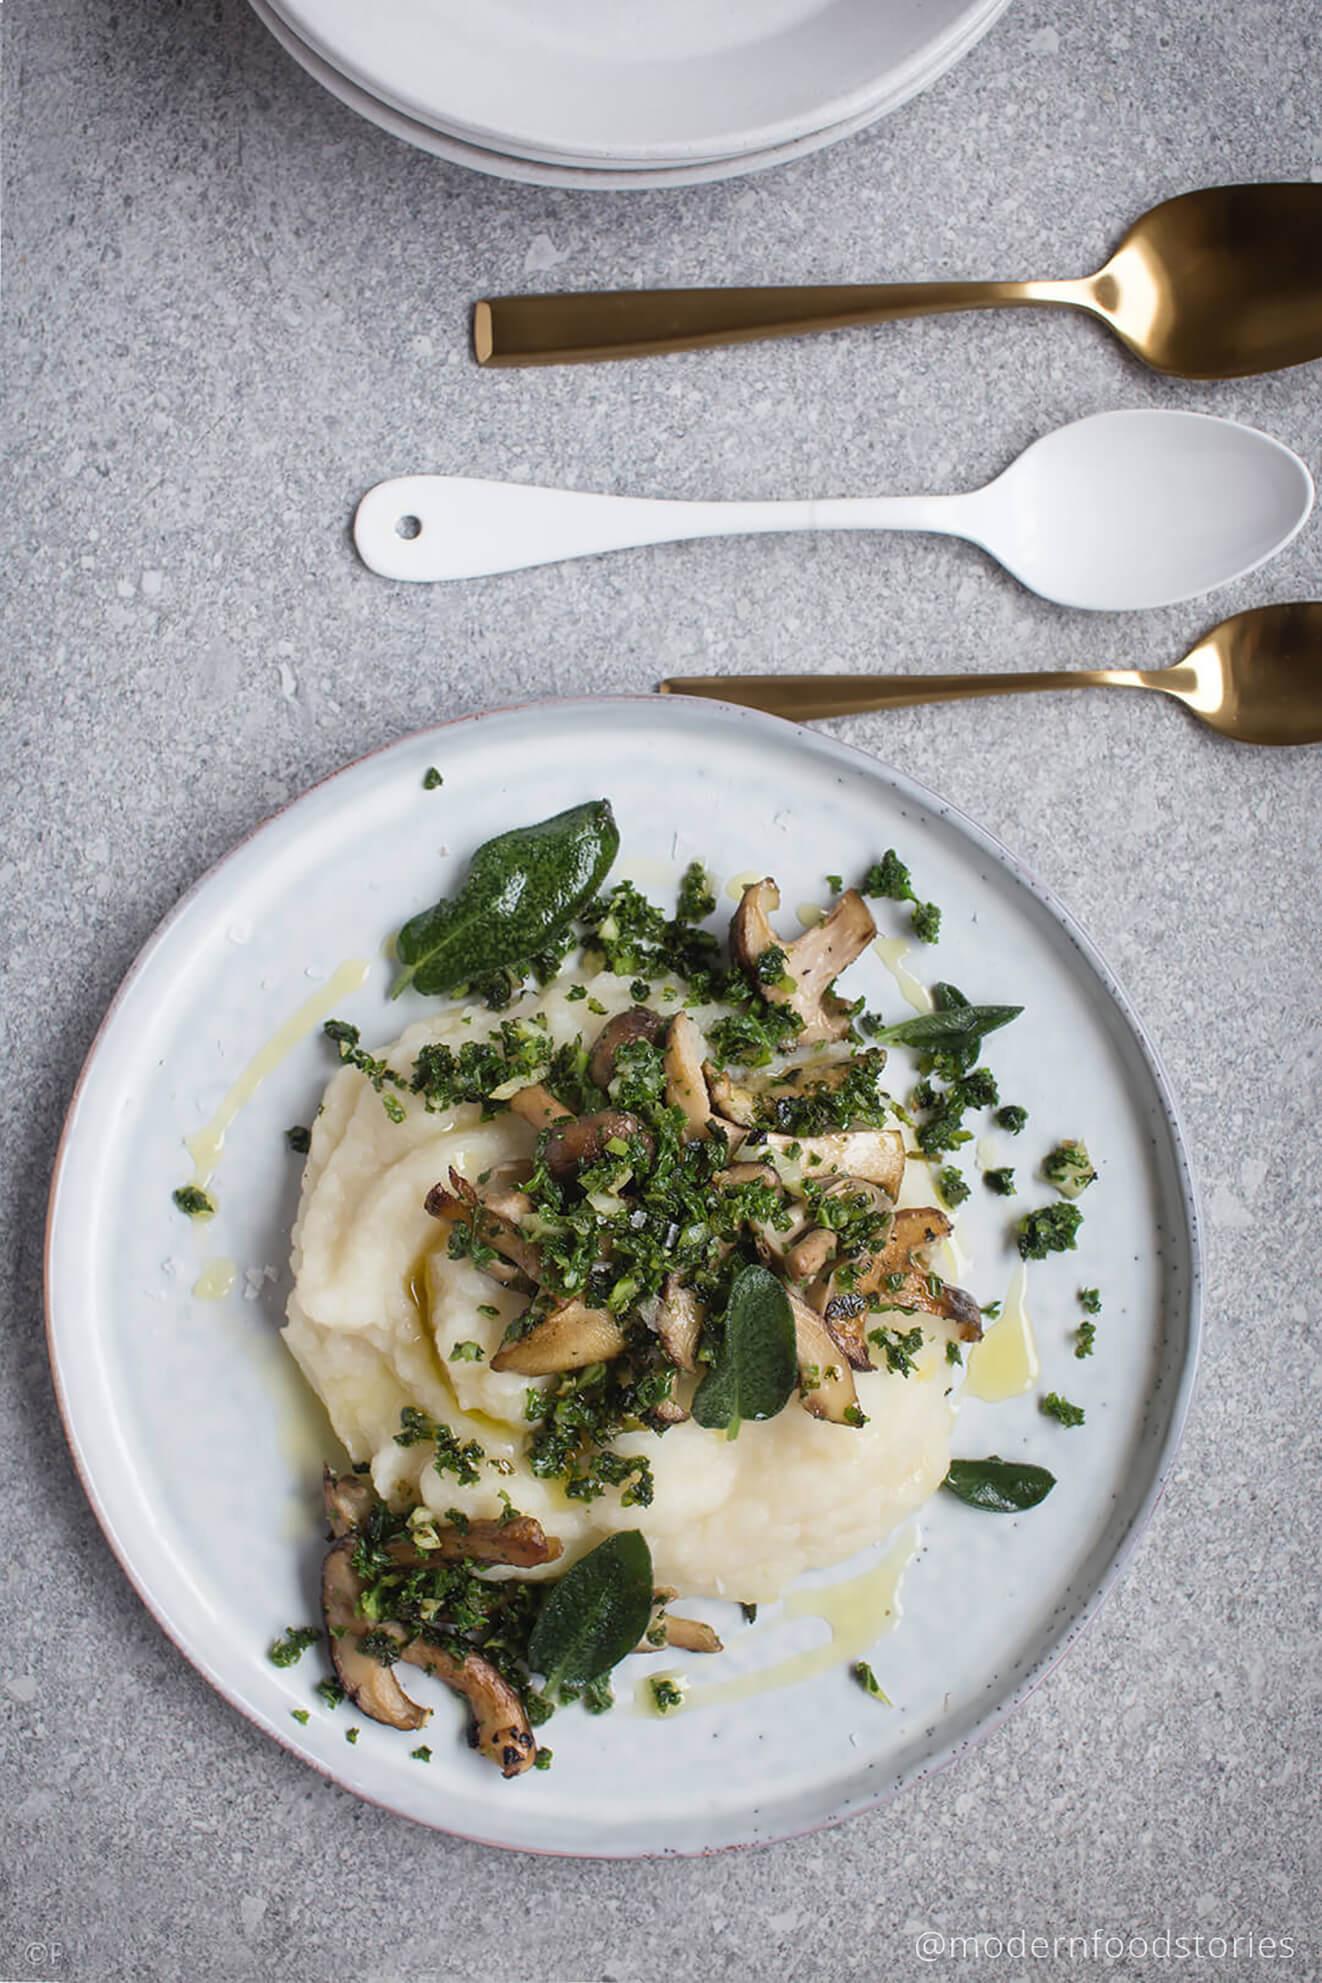 cauliflower mash recipe, cauliflower recipes, dairy free recipes, gluten free recipes, grain free recipes, Paleo, Keto, Paleo Crust, gut health, Autoimmune Paleo, Modern Food Stories, Keto Recipes, Low carb recipes, cauli mash